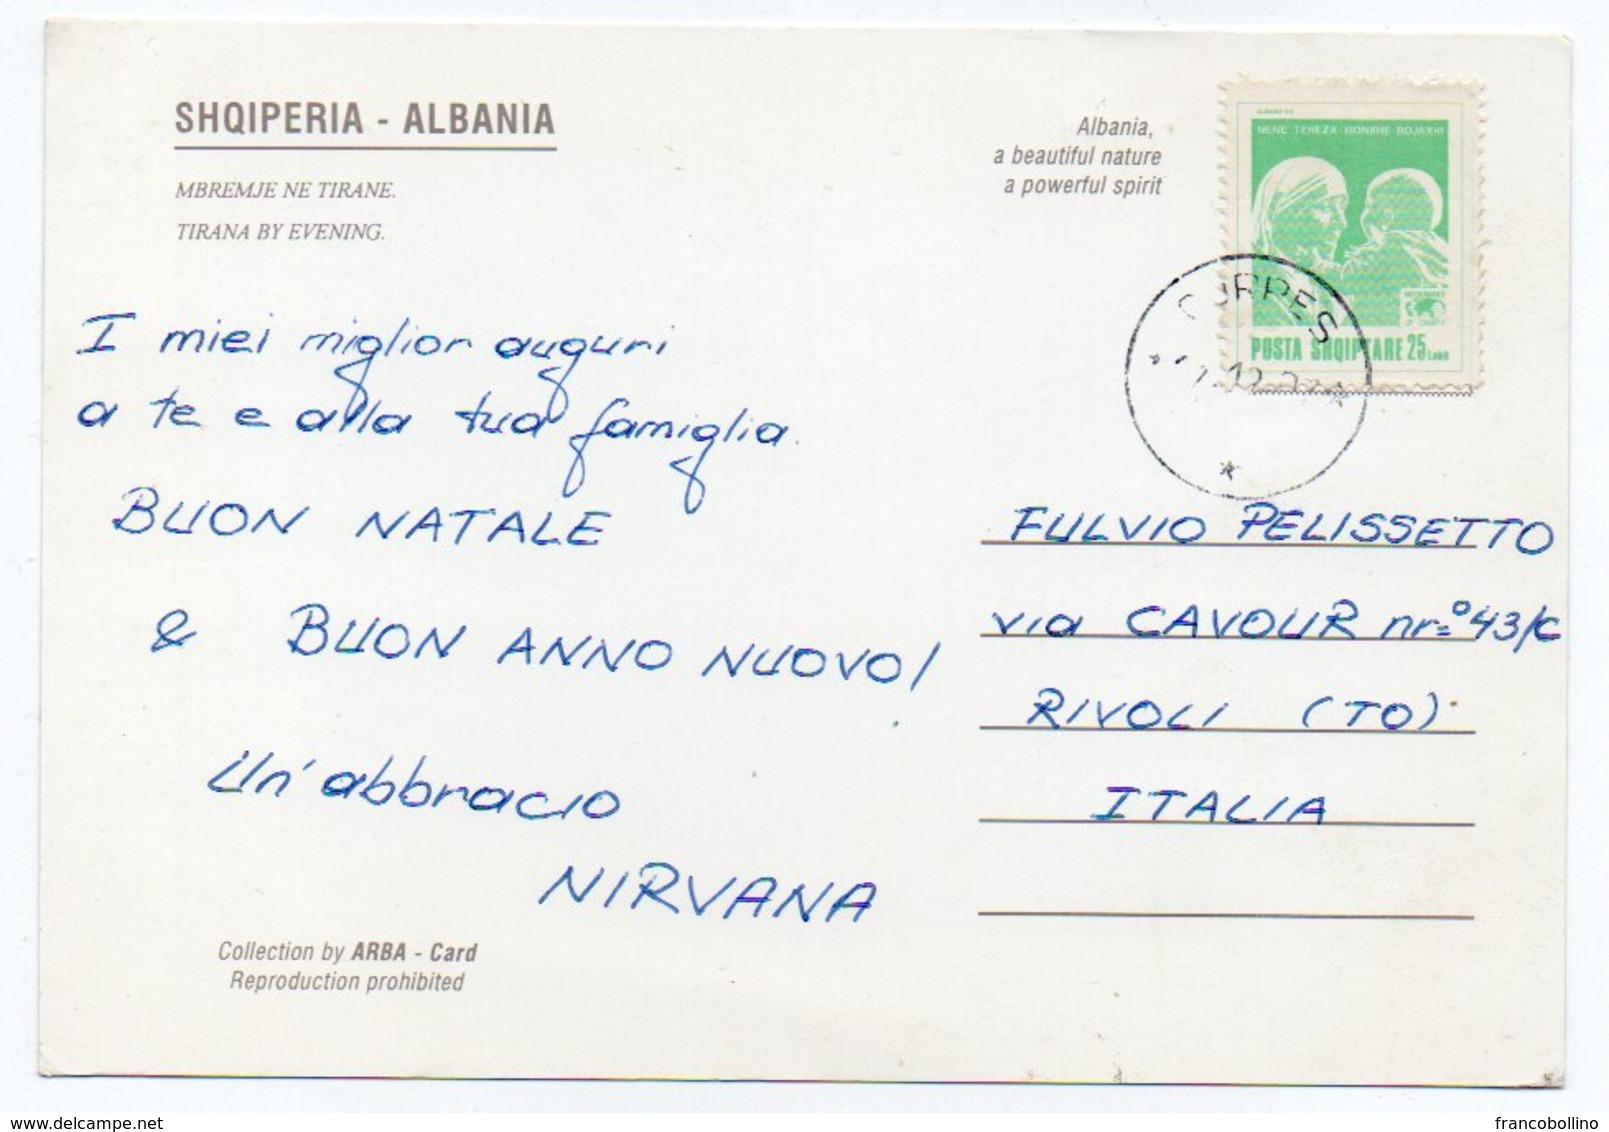 ALBANIE/ALBANIA - EVENING IN TIRANA / TIRANE / THEMATIC STAMP - MOTHER TERESA - Albania